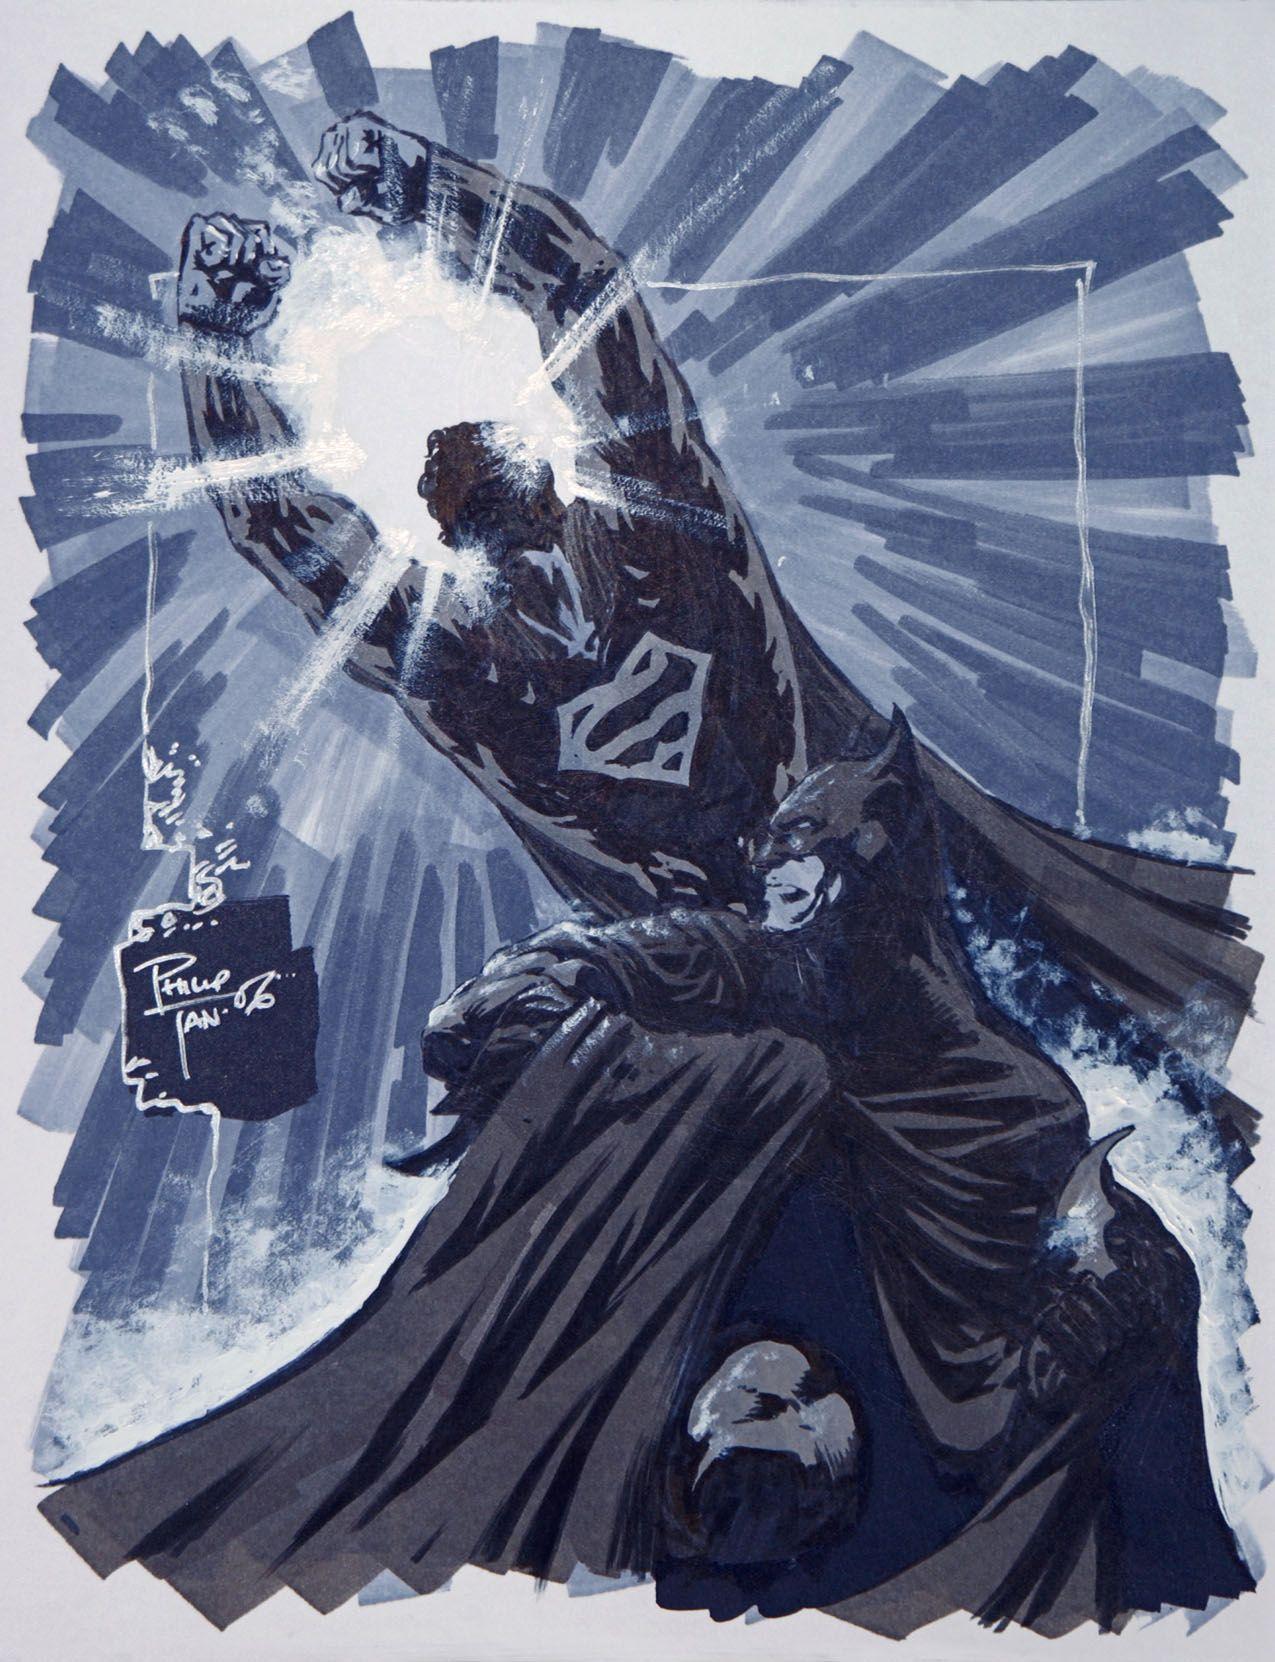 Superman / Batman by Philip Tan